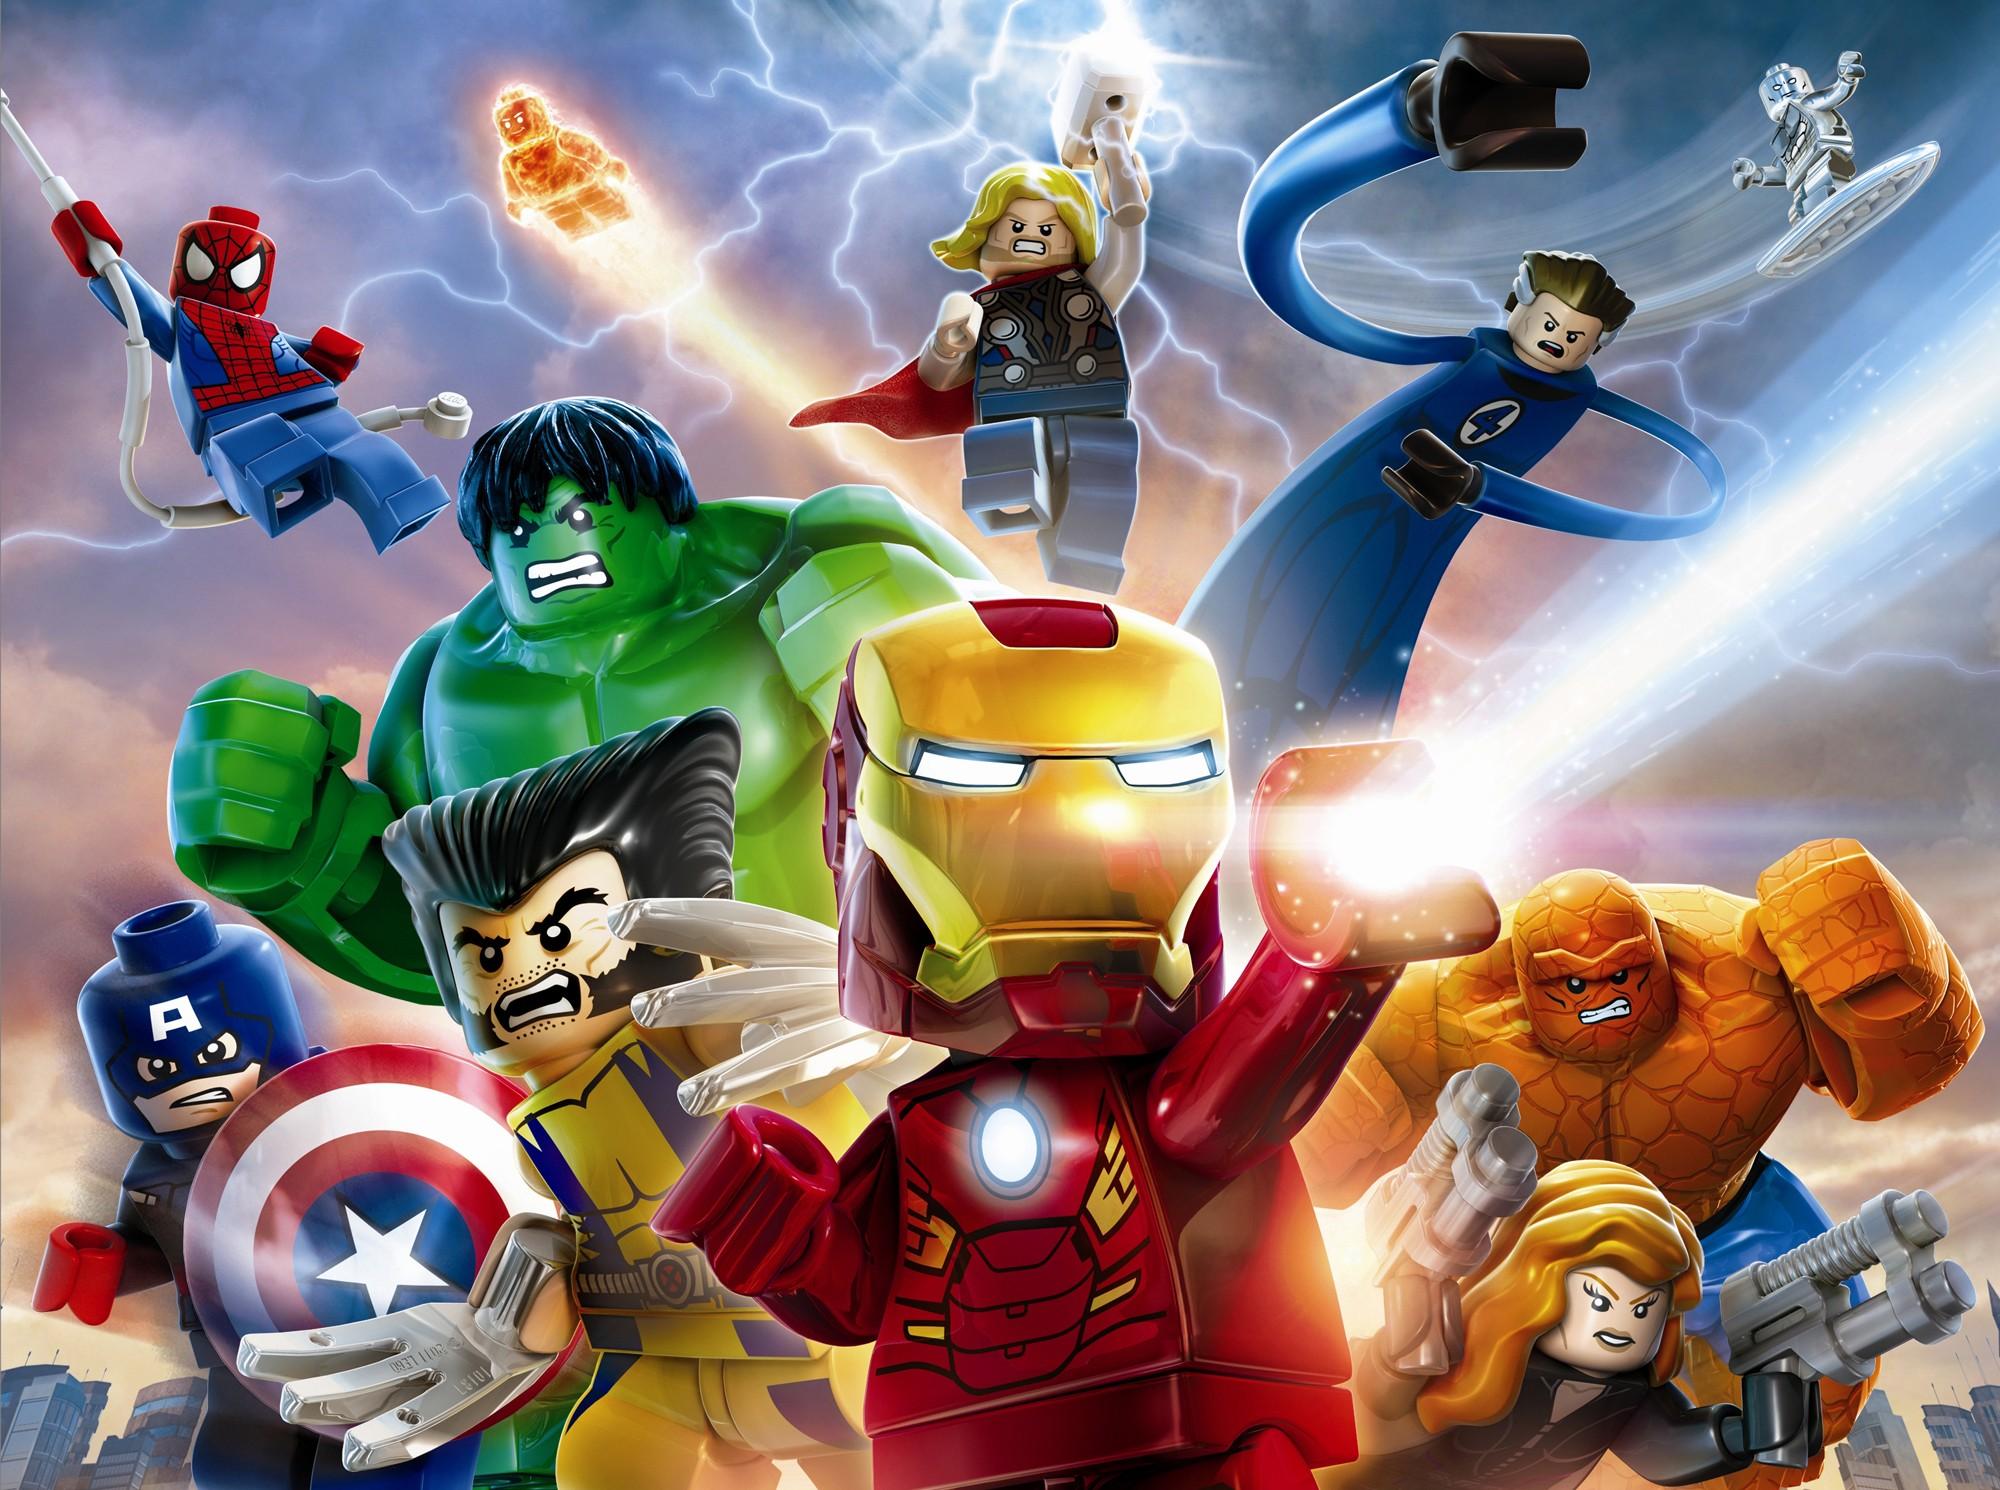 General 2000x1490 LEGO Marvel Super Heroes The Avengers Iron Man Hulk Captain America Fantastic Four Black Widow Thor Spider-Man Wolverine Marvel Heroes Marvel Comics video games